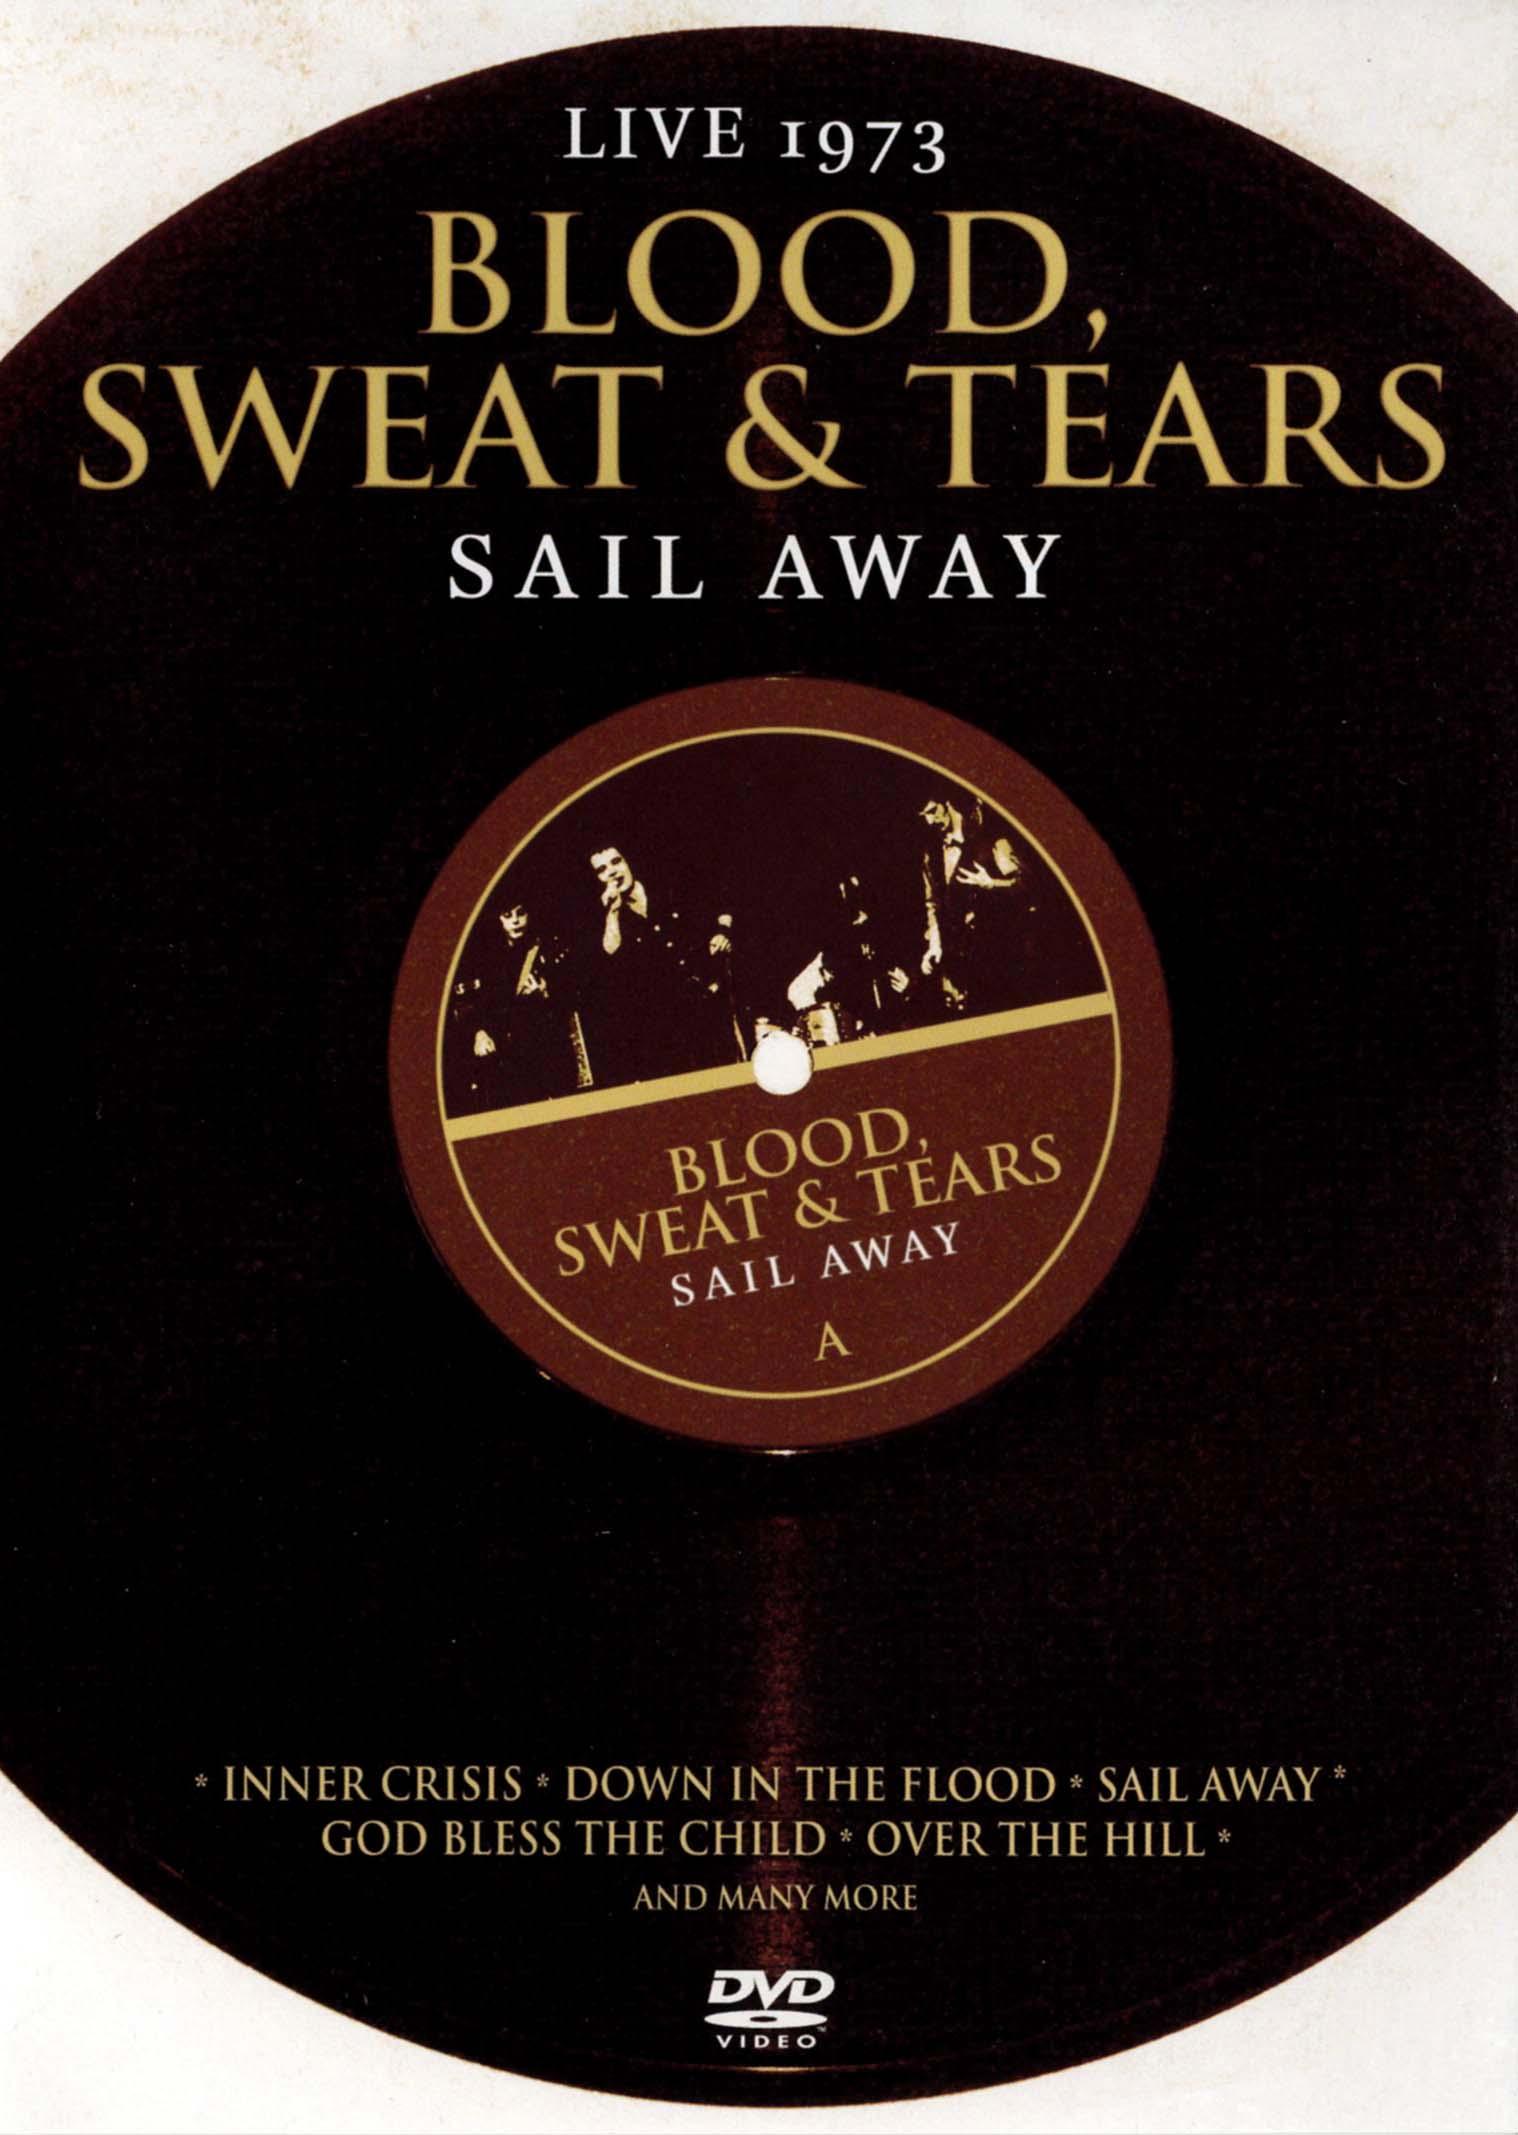 Blood, Sweat & Tears: Sail Away - Live 1973